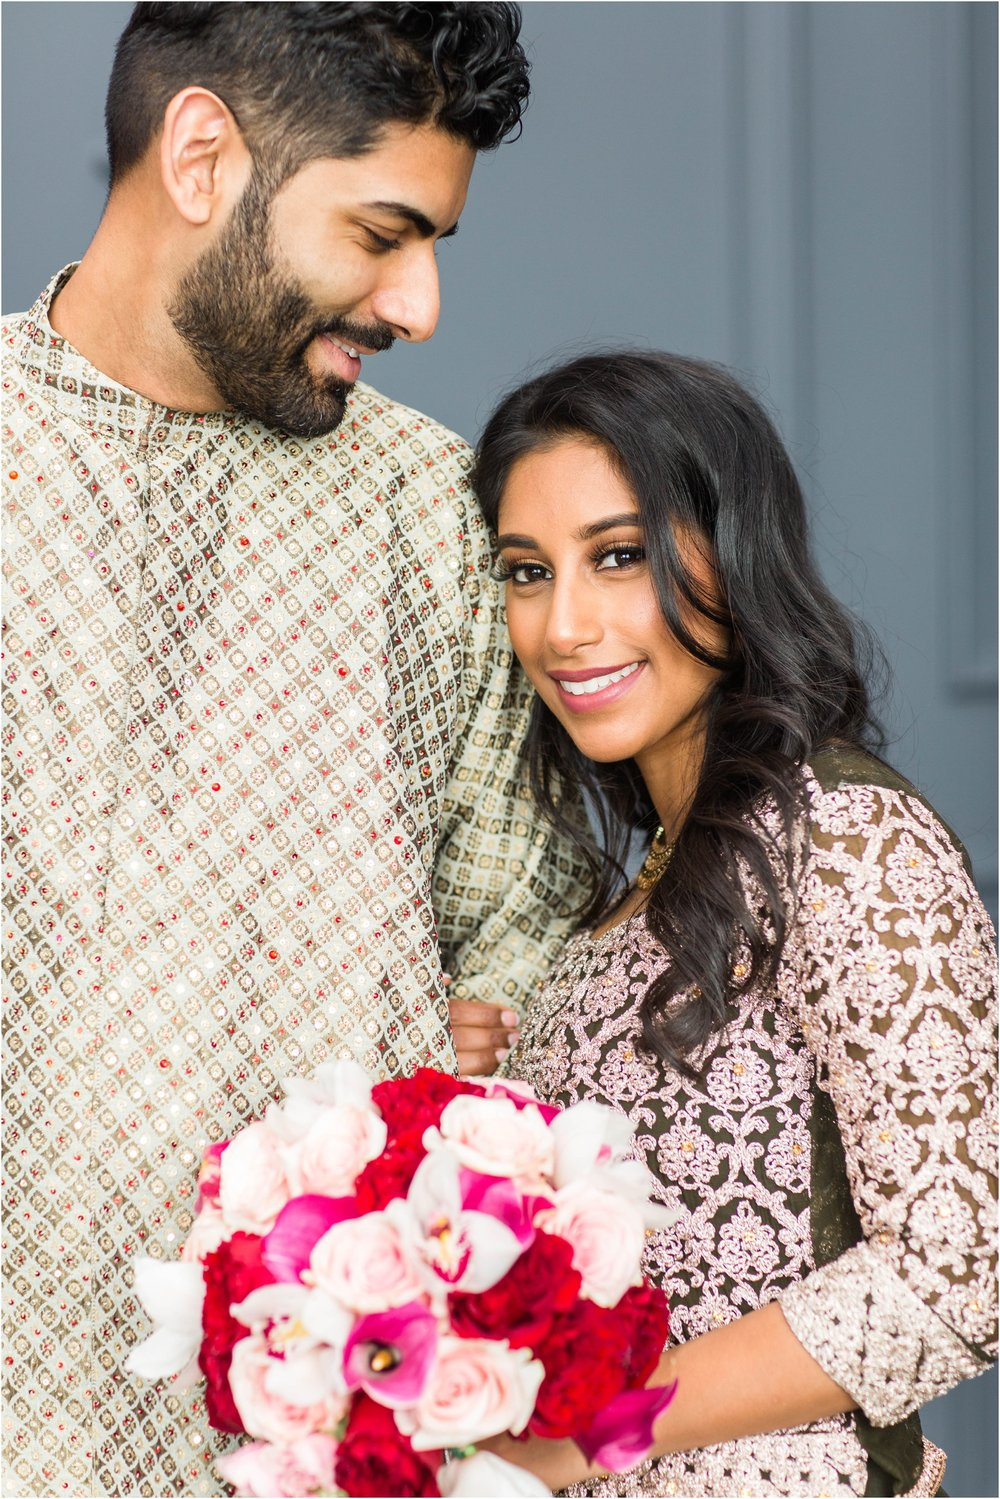 Mint-Room-Studios-Anniversary-Session-Toronto-Mississauga-Brampton-Scarborough-GTA-Pakistani-Indian-Wedding-Engagement-Photographer-Photography_0033.jpg